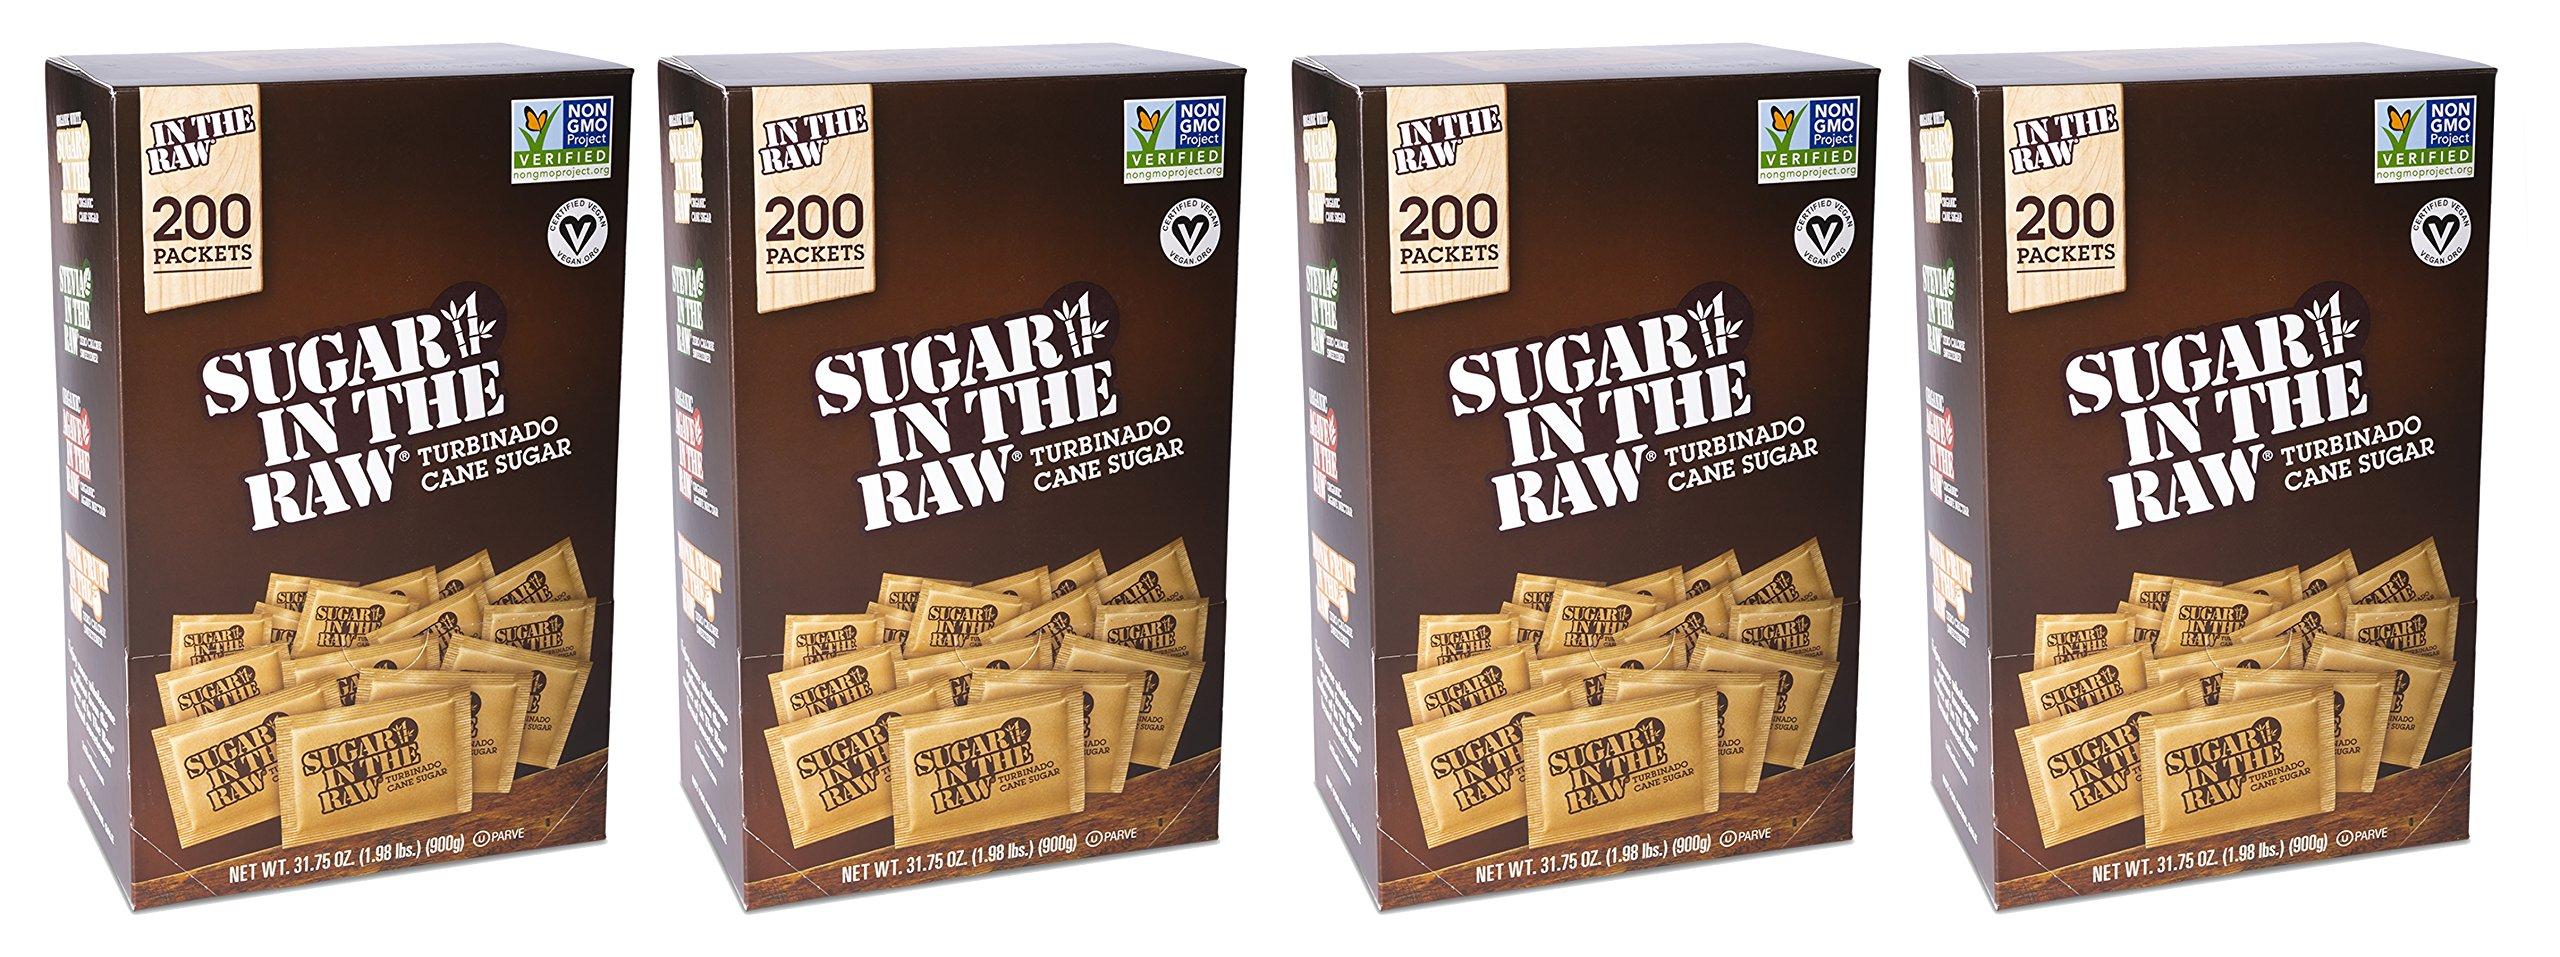 Folgers Sugar In The Raw Turbinado Cane Sugar, 200 Count (Pack Of 4)